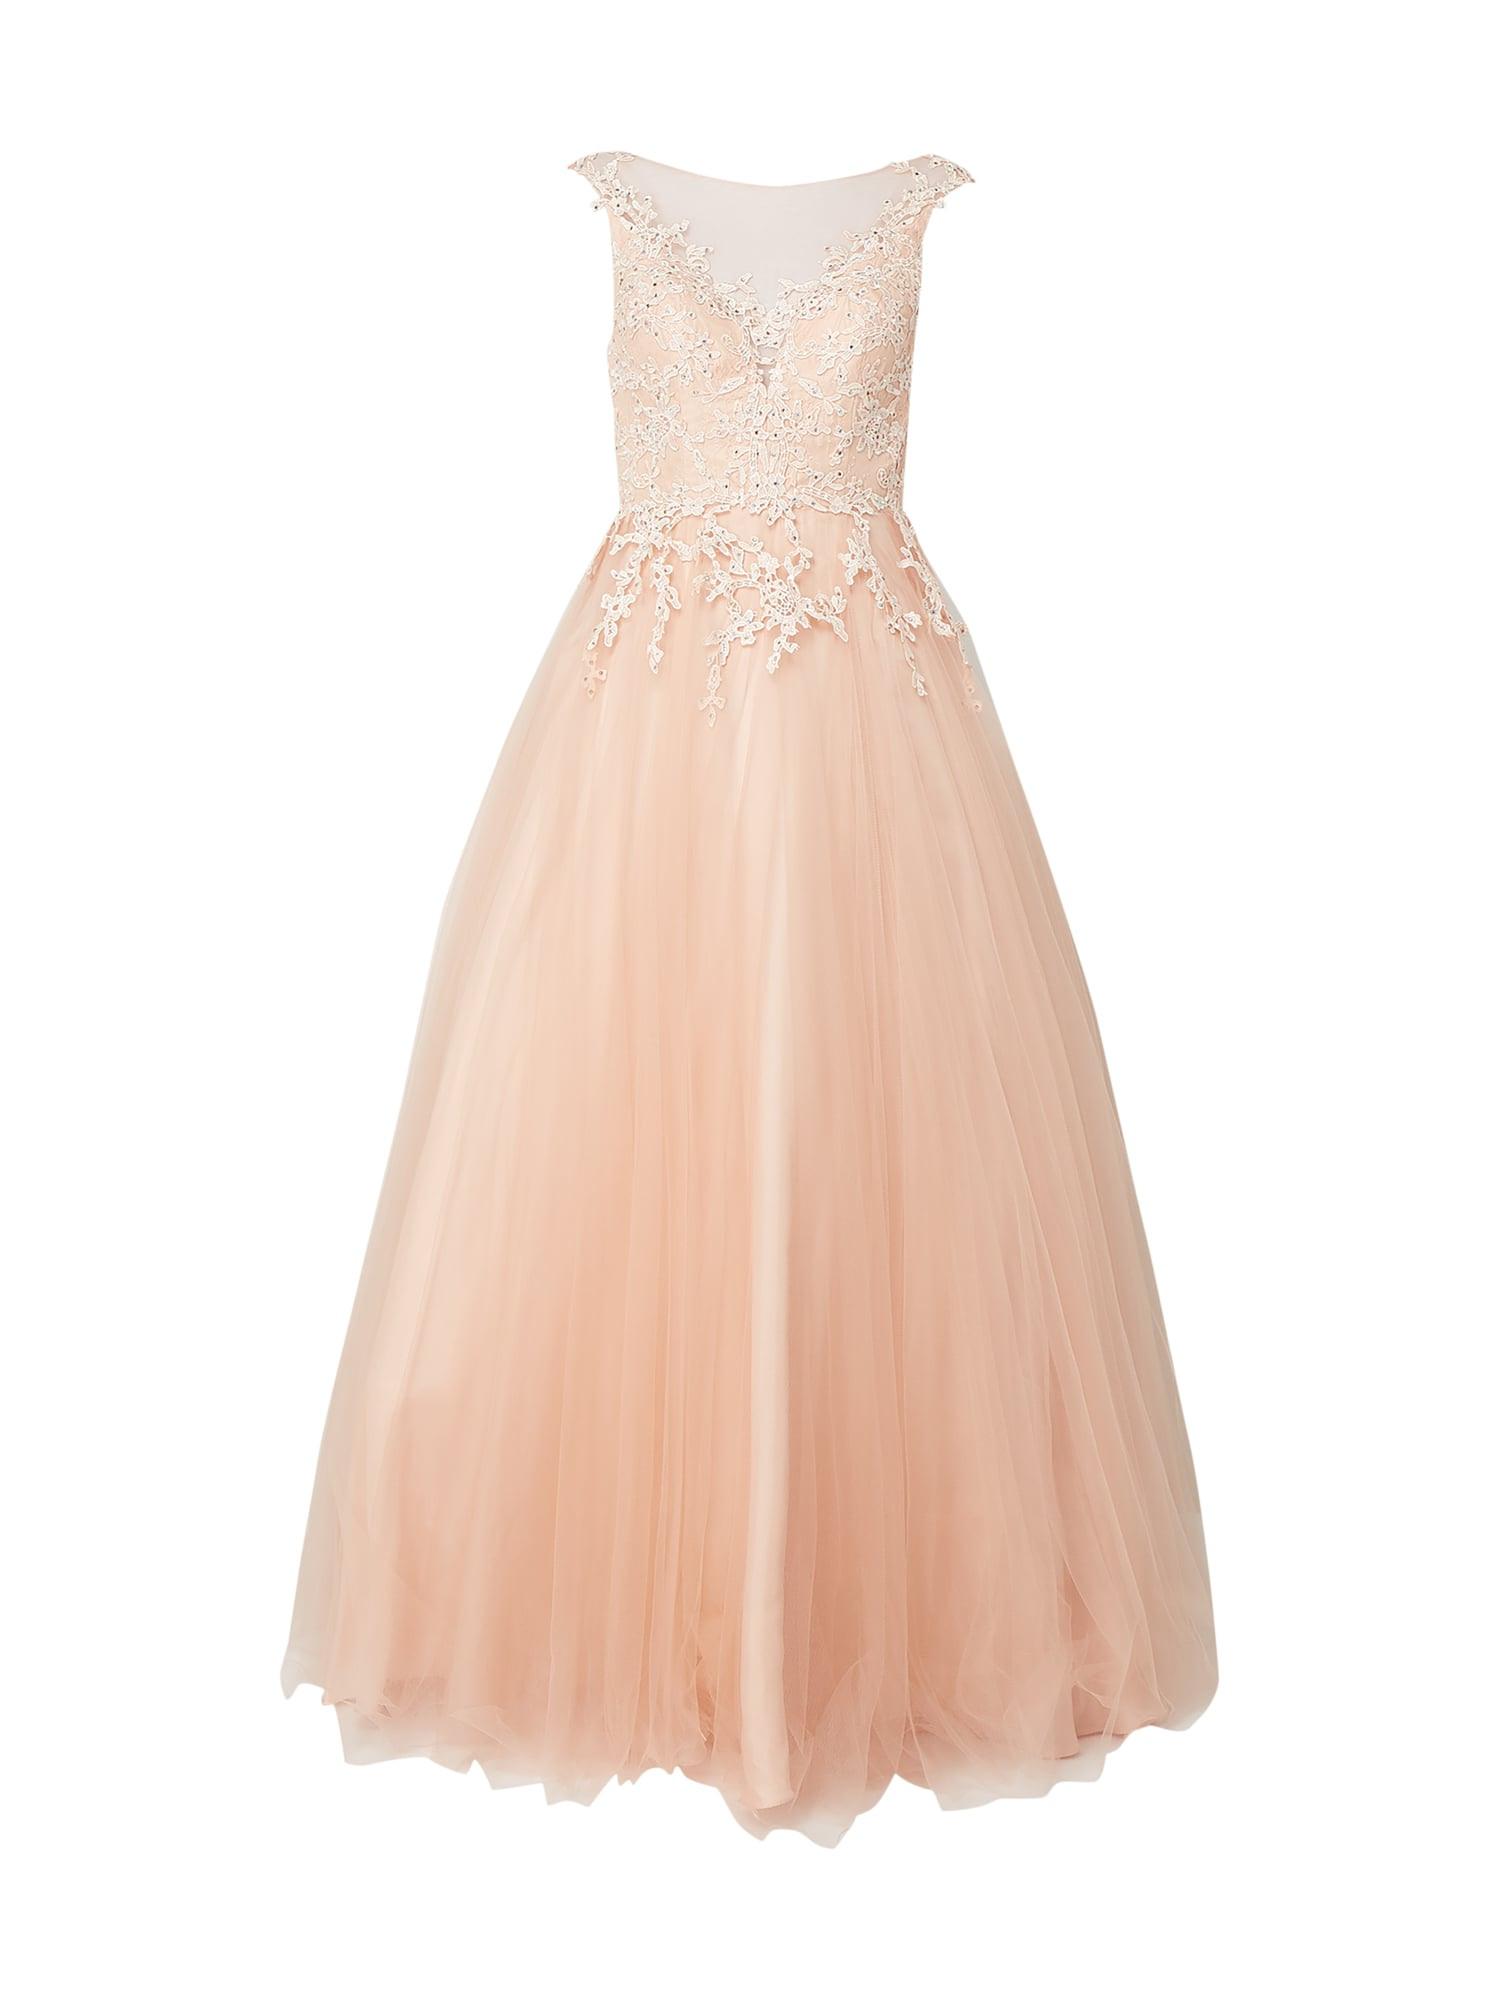 Formal Wunderbar Abend Kleid Rose BoutiqueDesigner Schön Abend Kleid Rose Bester Preis